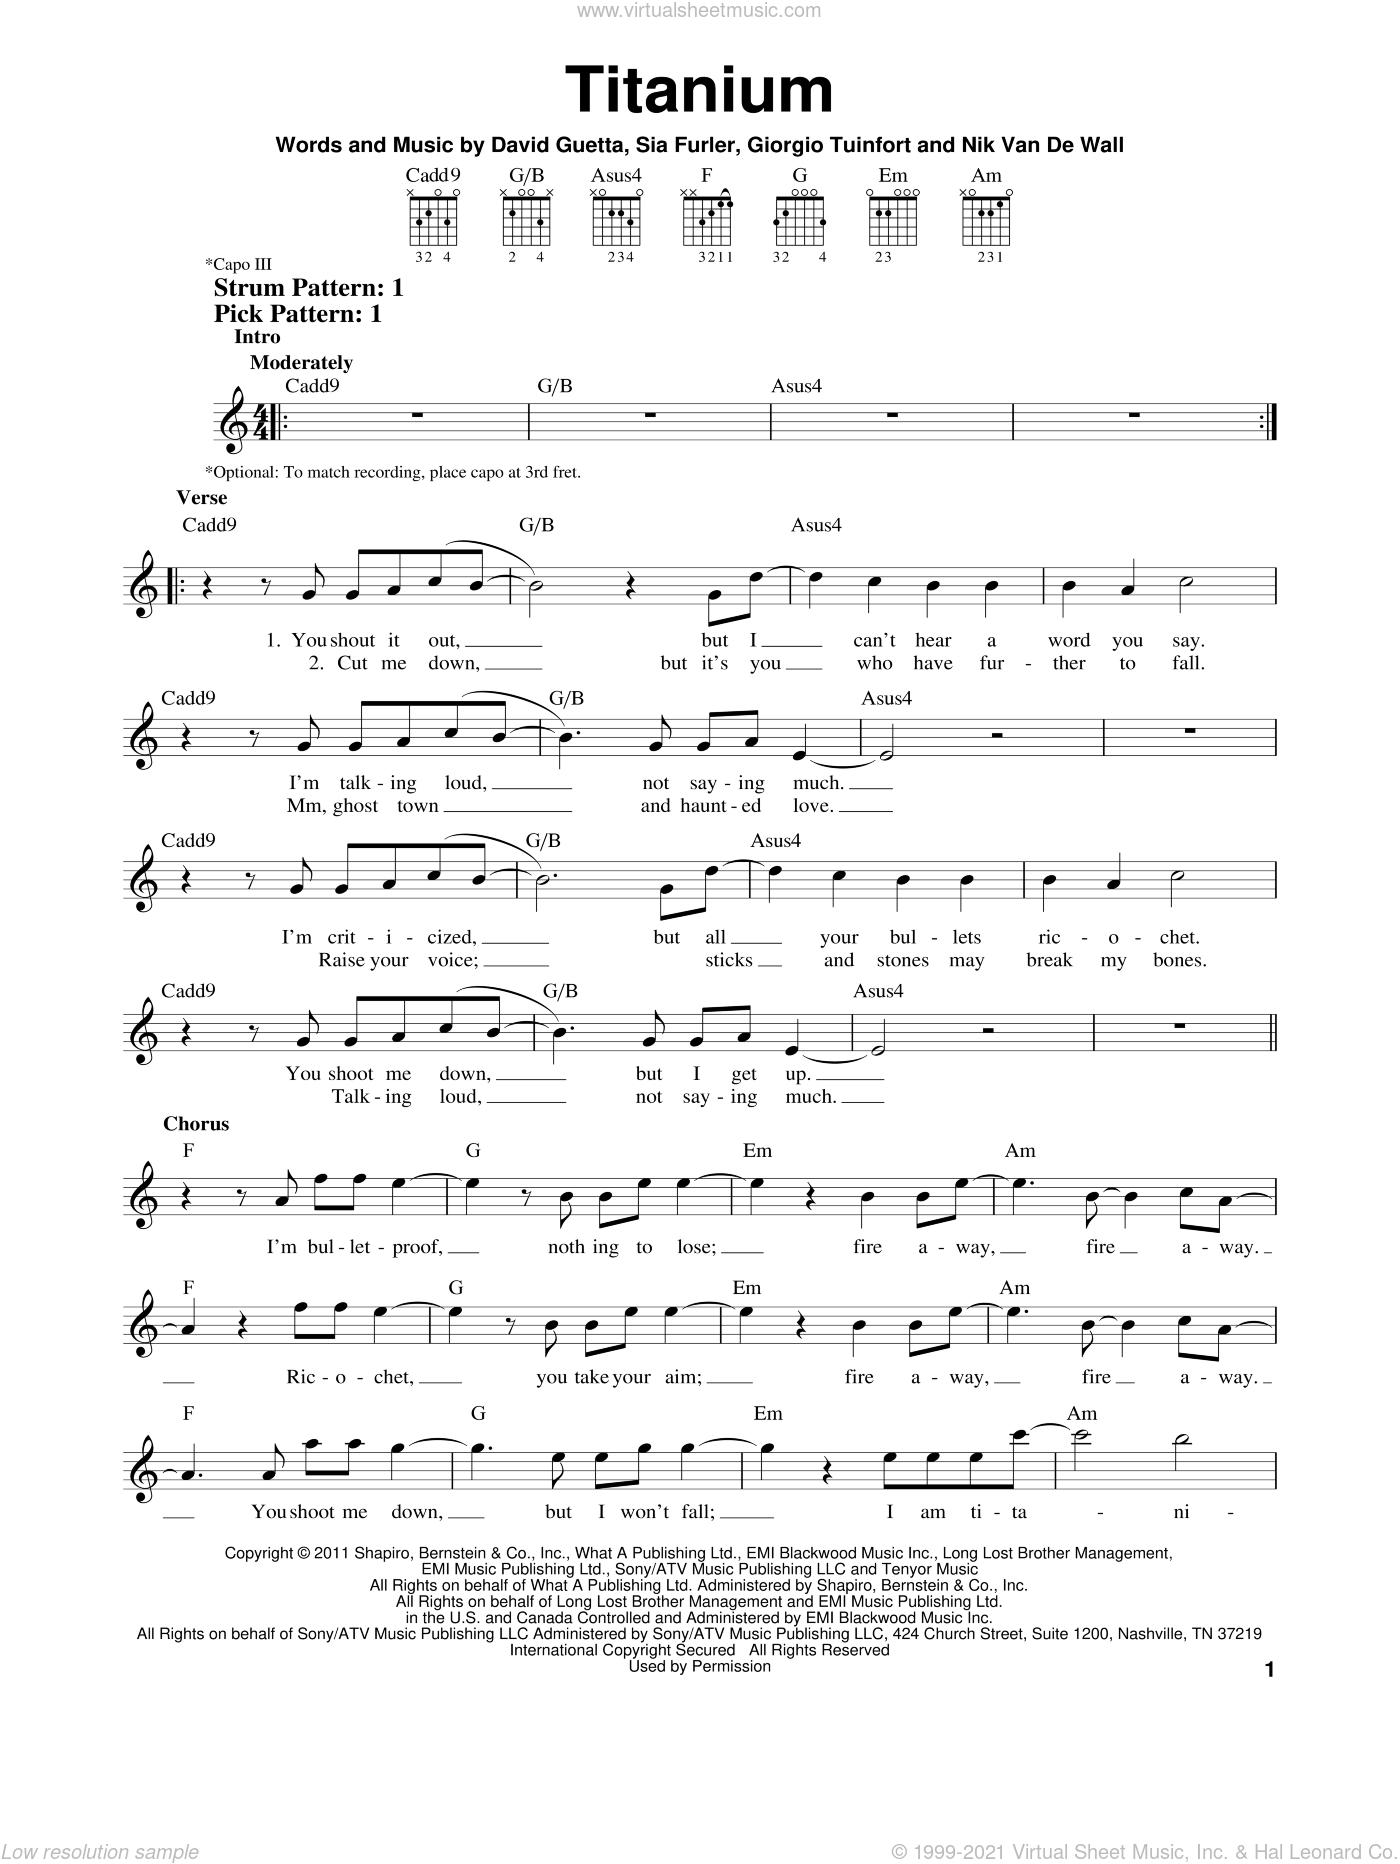 Titanium (feat. Sia) sheet music for guitar solo (chords) by David Guetta, David Guetta featuring Sia, Sia, Giorgio Tuinfort, Nick Van De Wall and Sia Furler, easy guitar (chords)